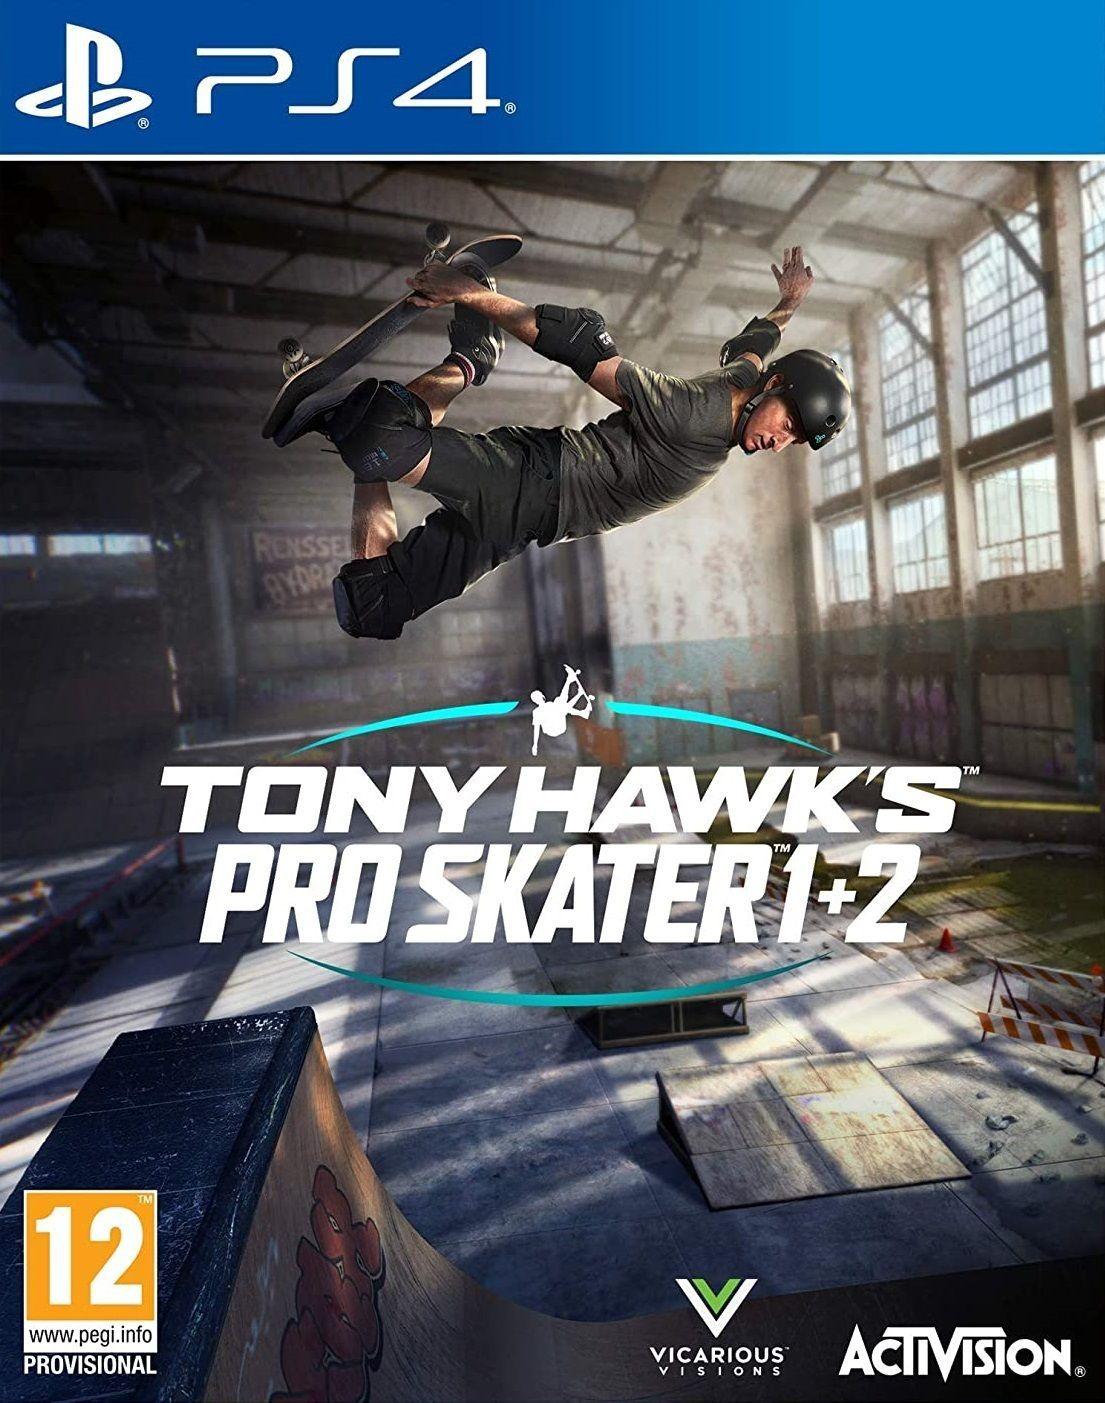 Tony Hawk Ps4